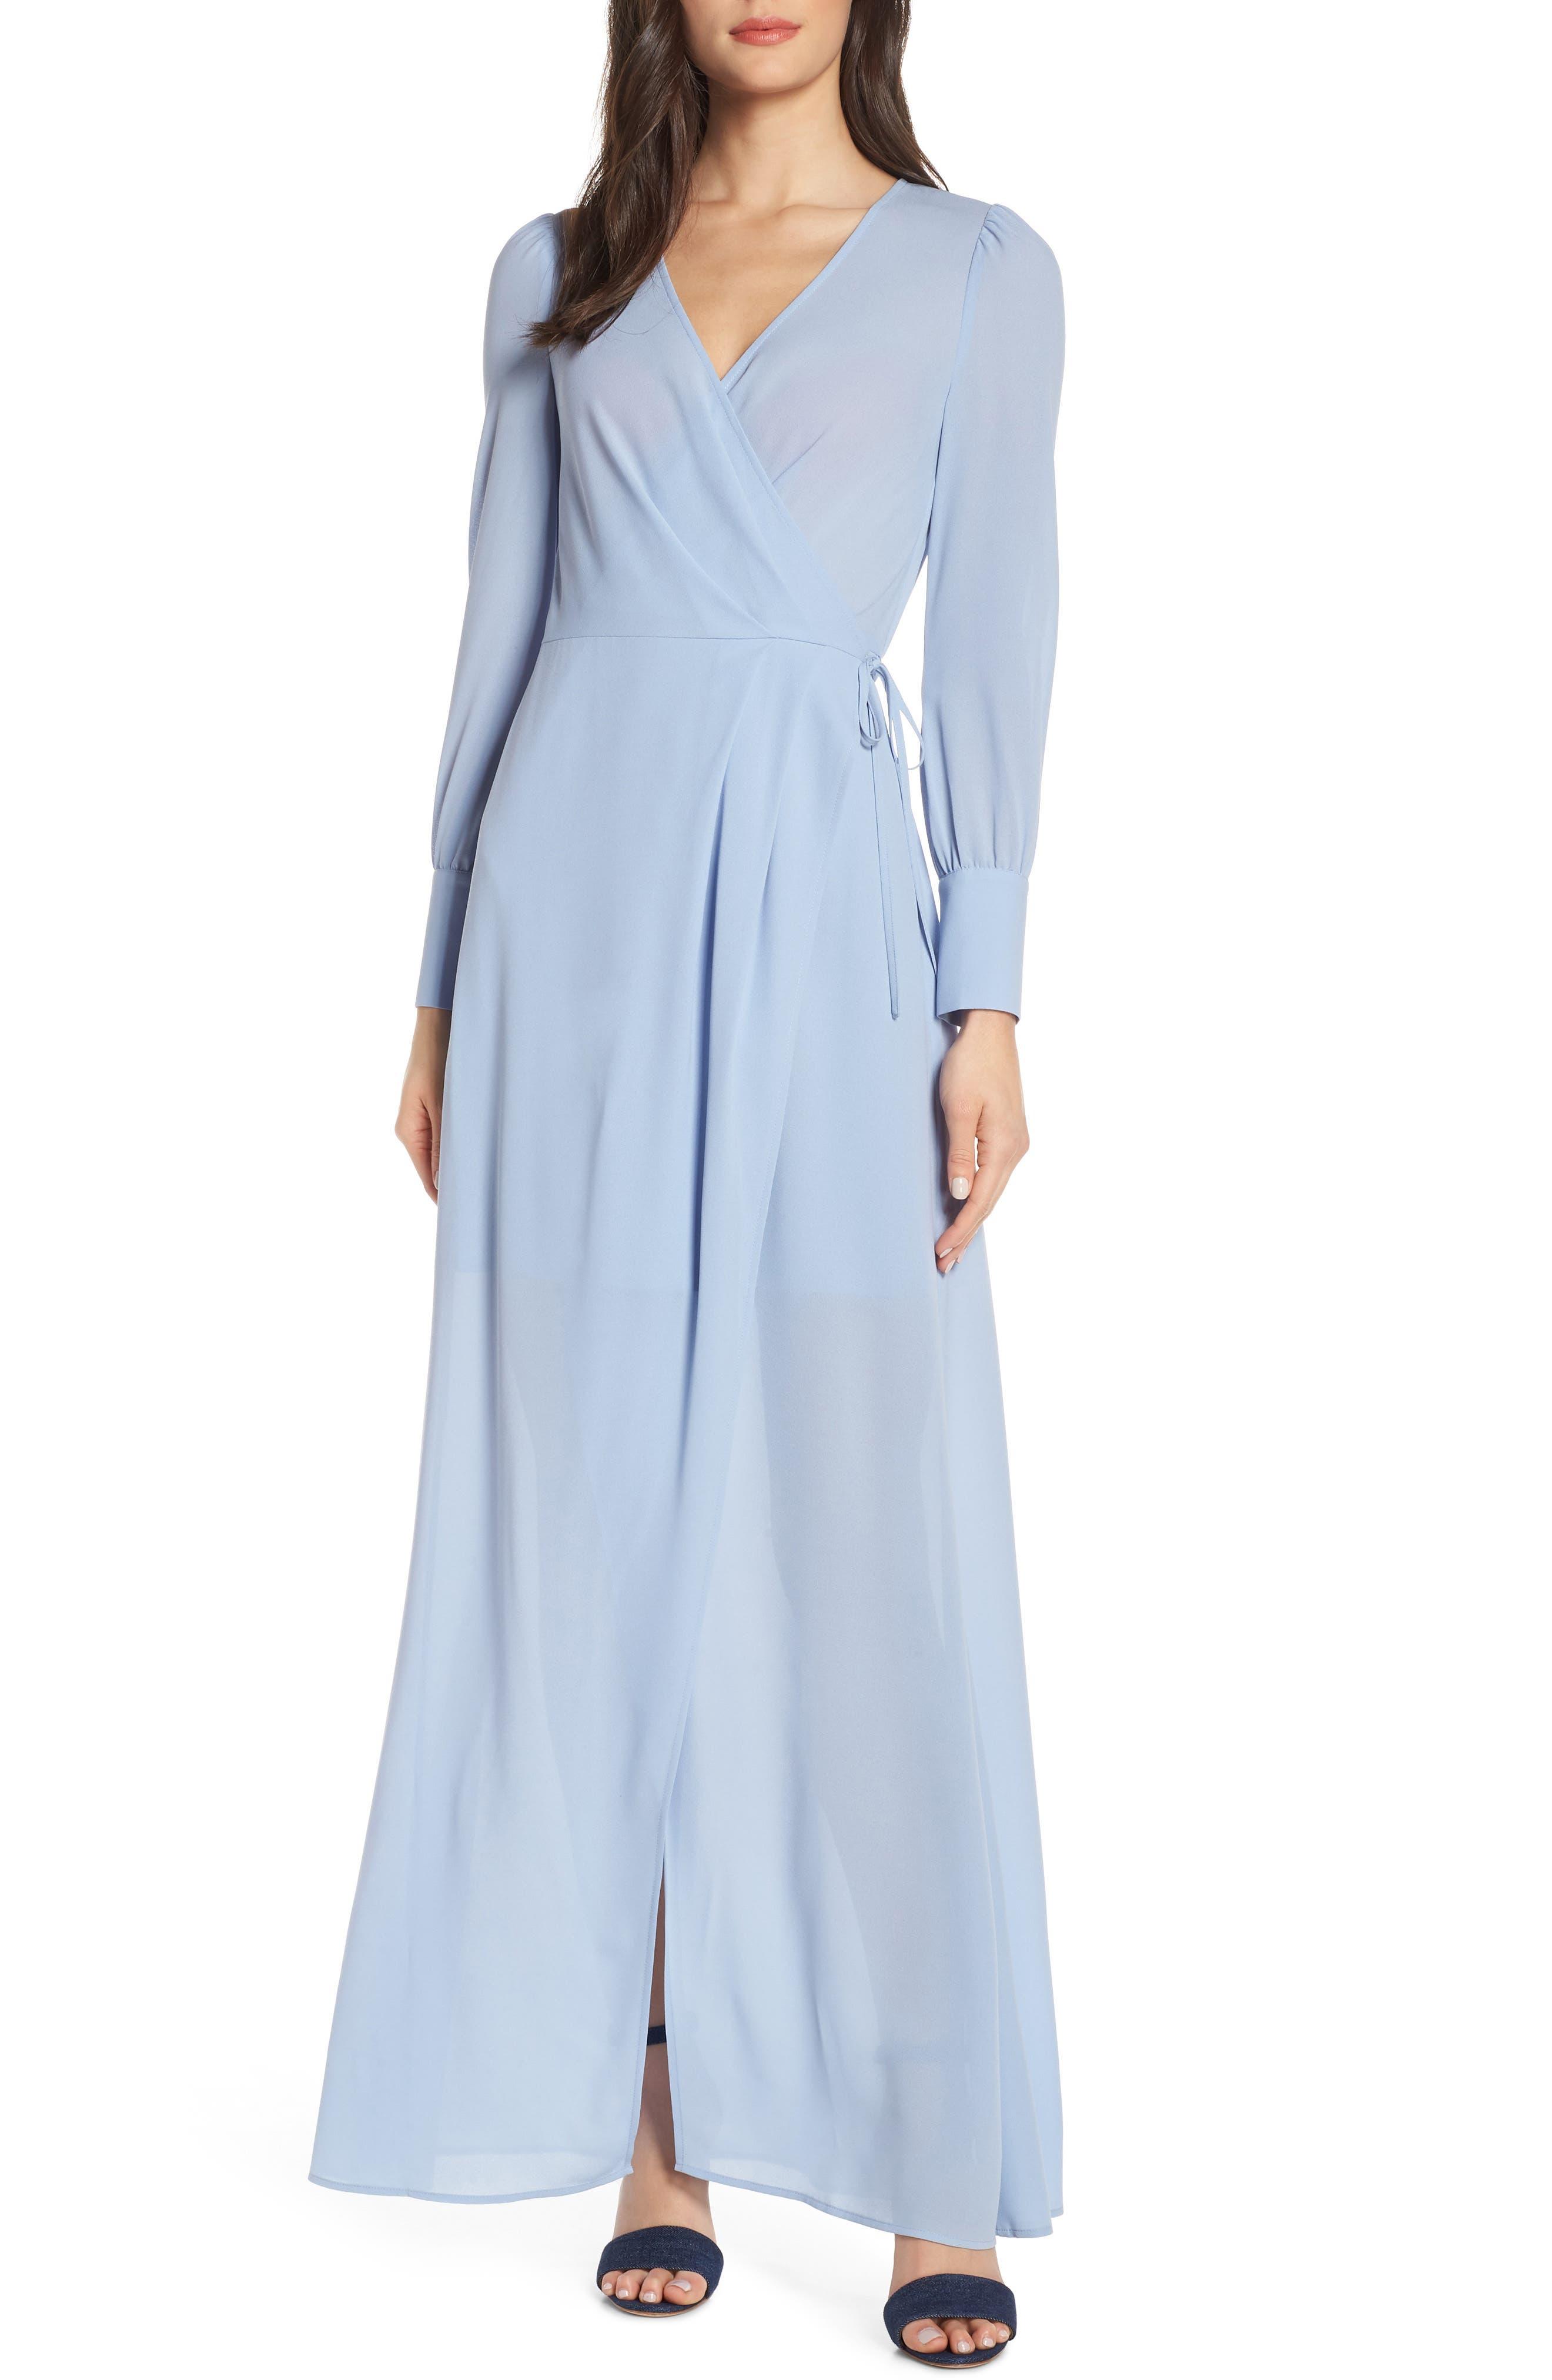 ALI & JAY, Garden Stroll Wrap Maxi Dress, Main thumbnail 1, color, 400